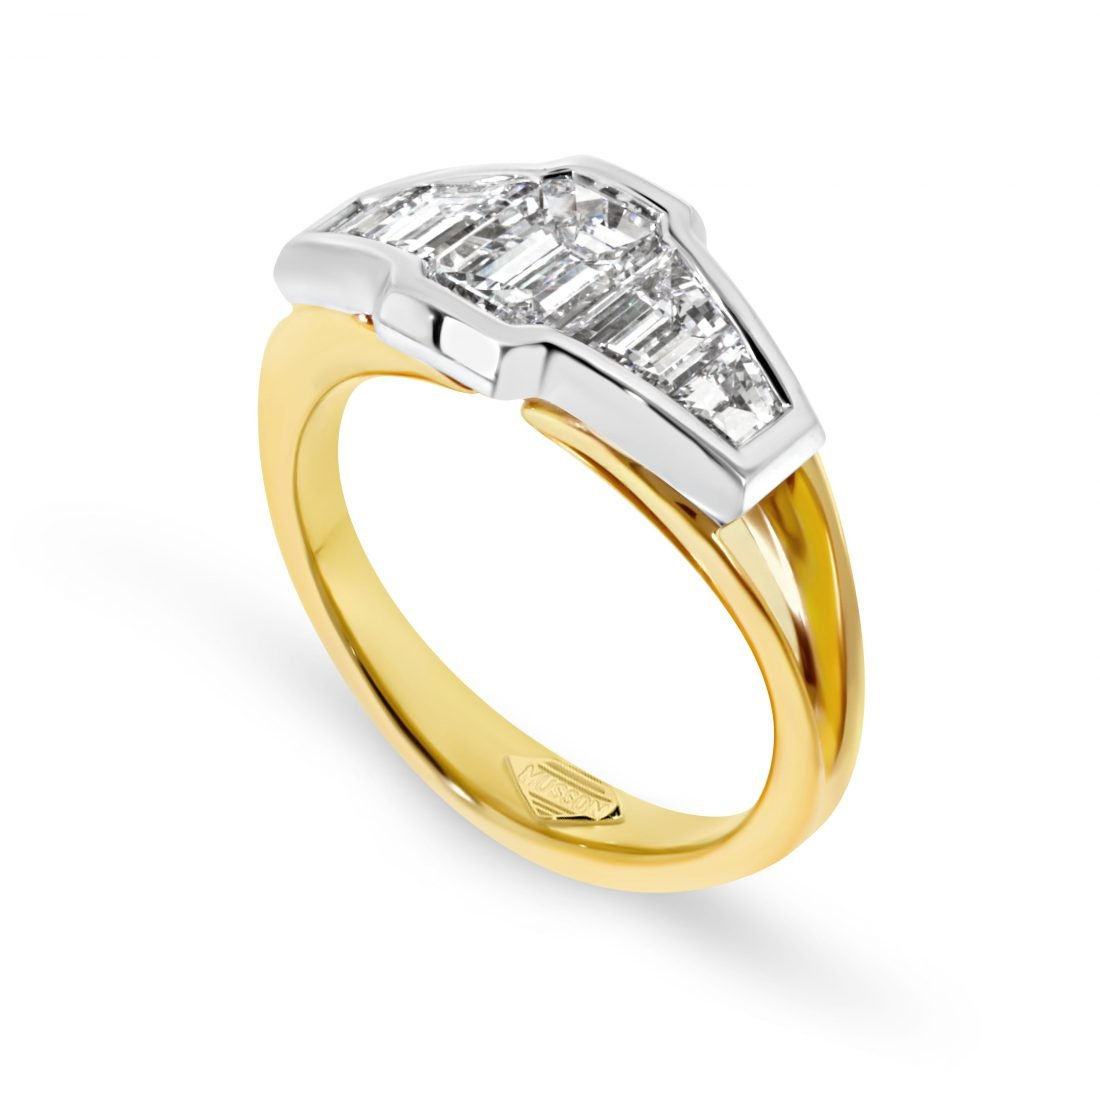 Vivid Bridge Emerald cut Diamond Ring